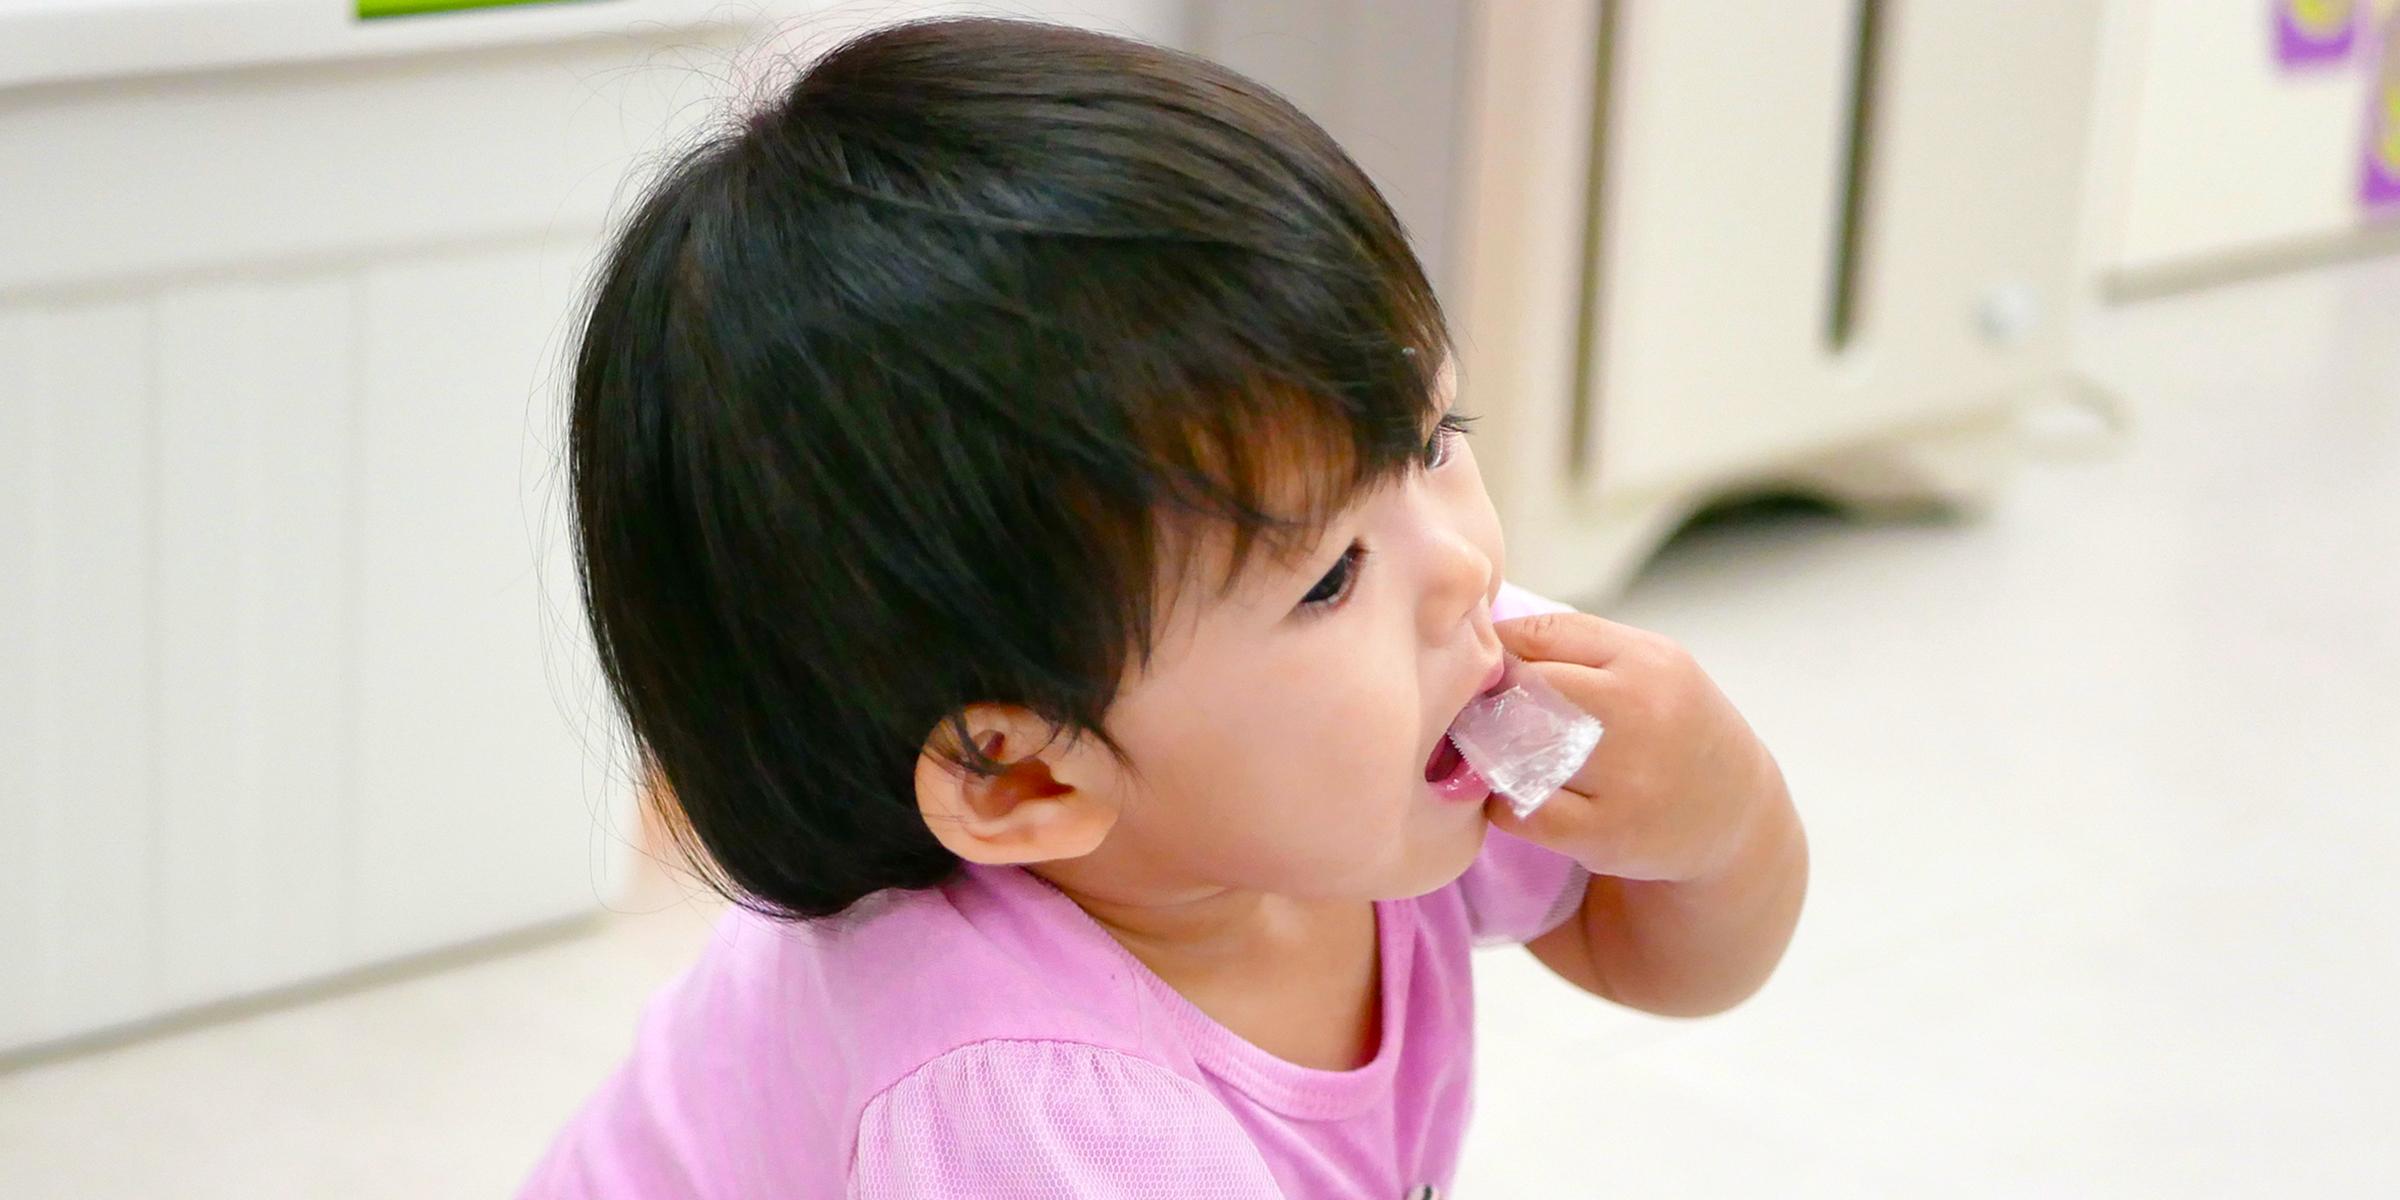 children-choking-today-main-190411_74b2793308c469e380da95ac54448bcc